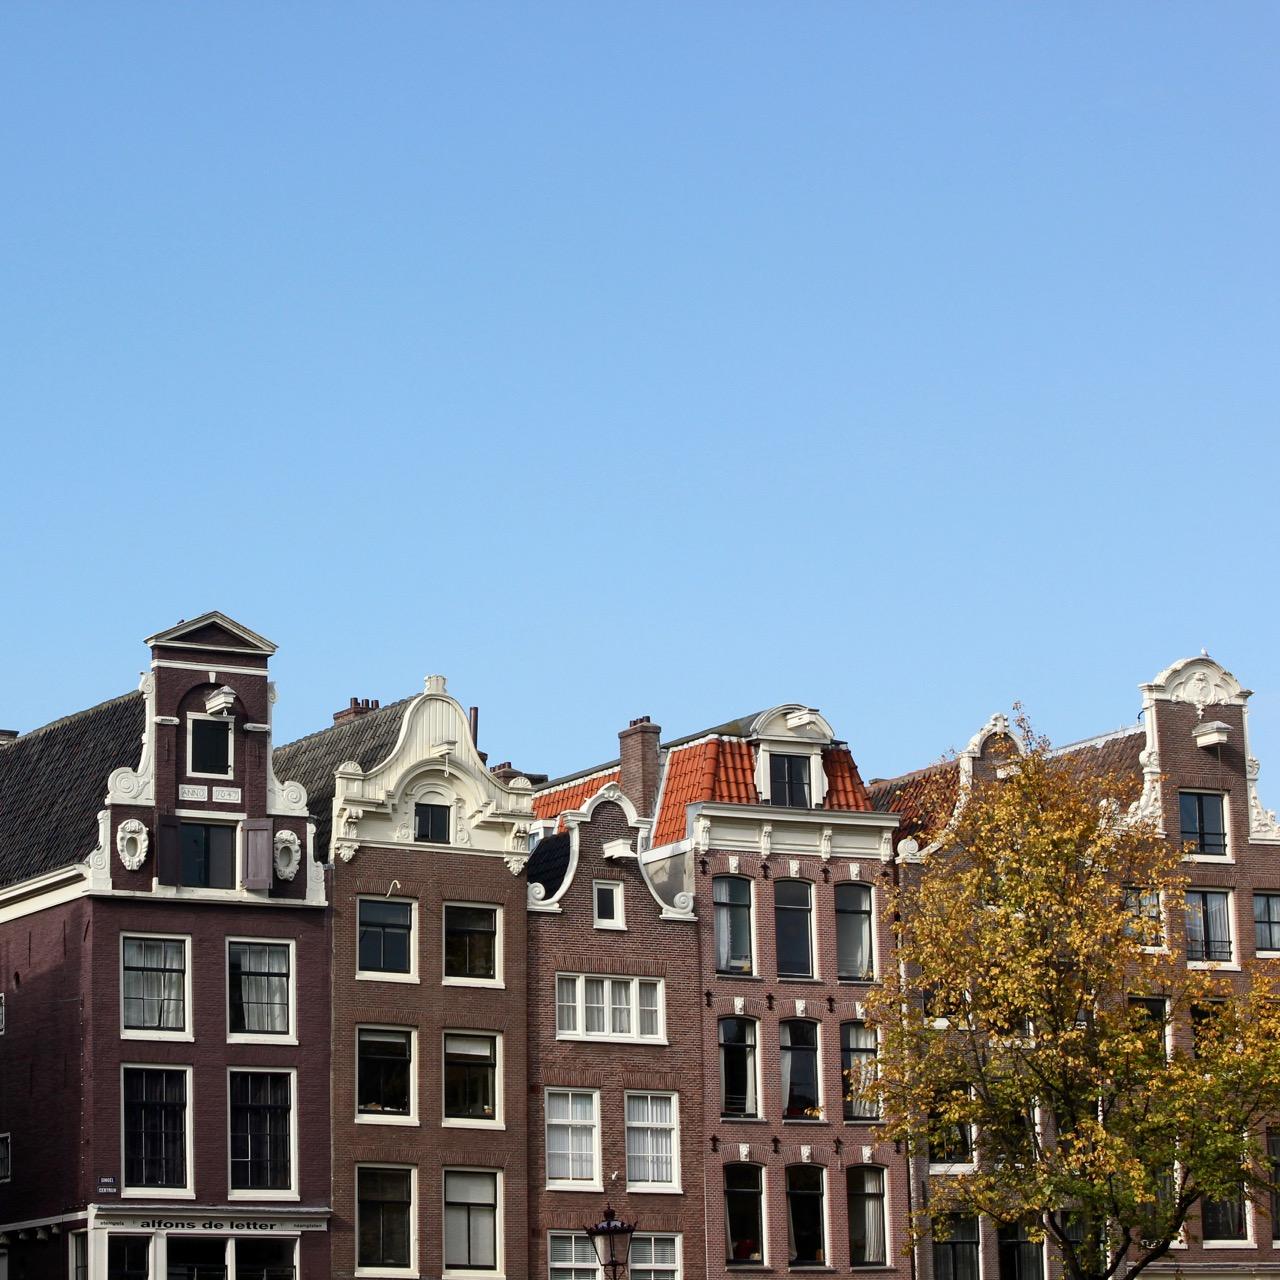 Amsterdam, Netherlands - 6